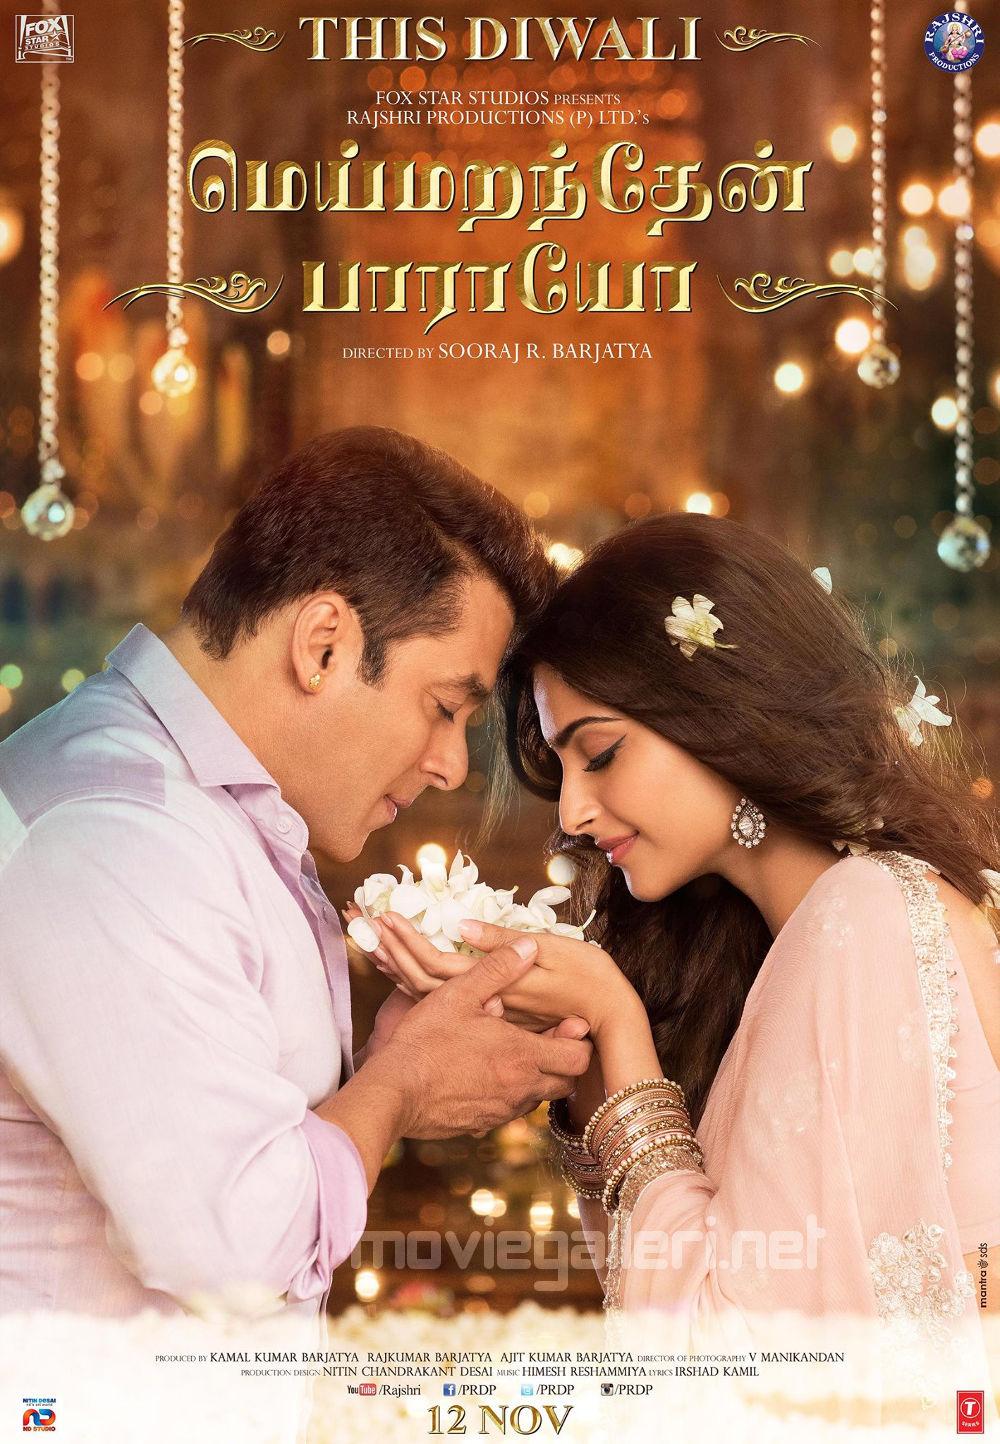 Salman Khan, Sonam Kapoor starring Meimaranthen Parayo Movie First Look Poster